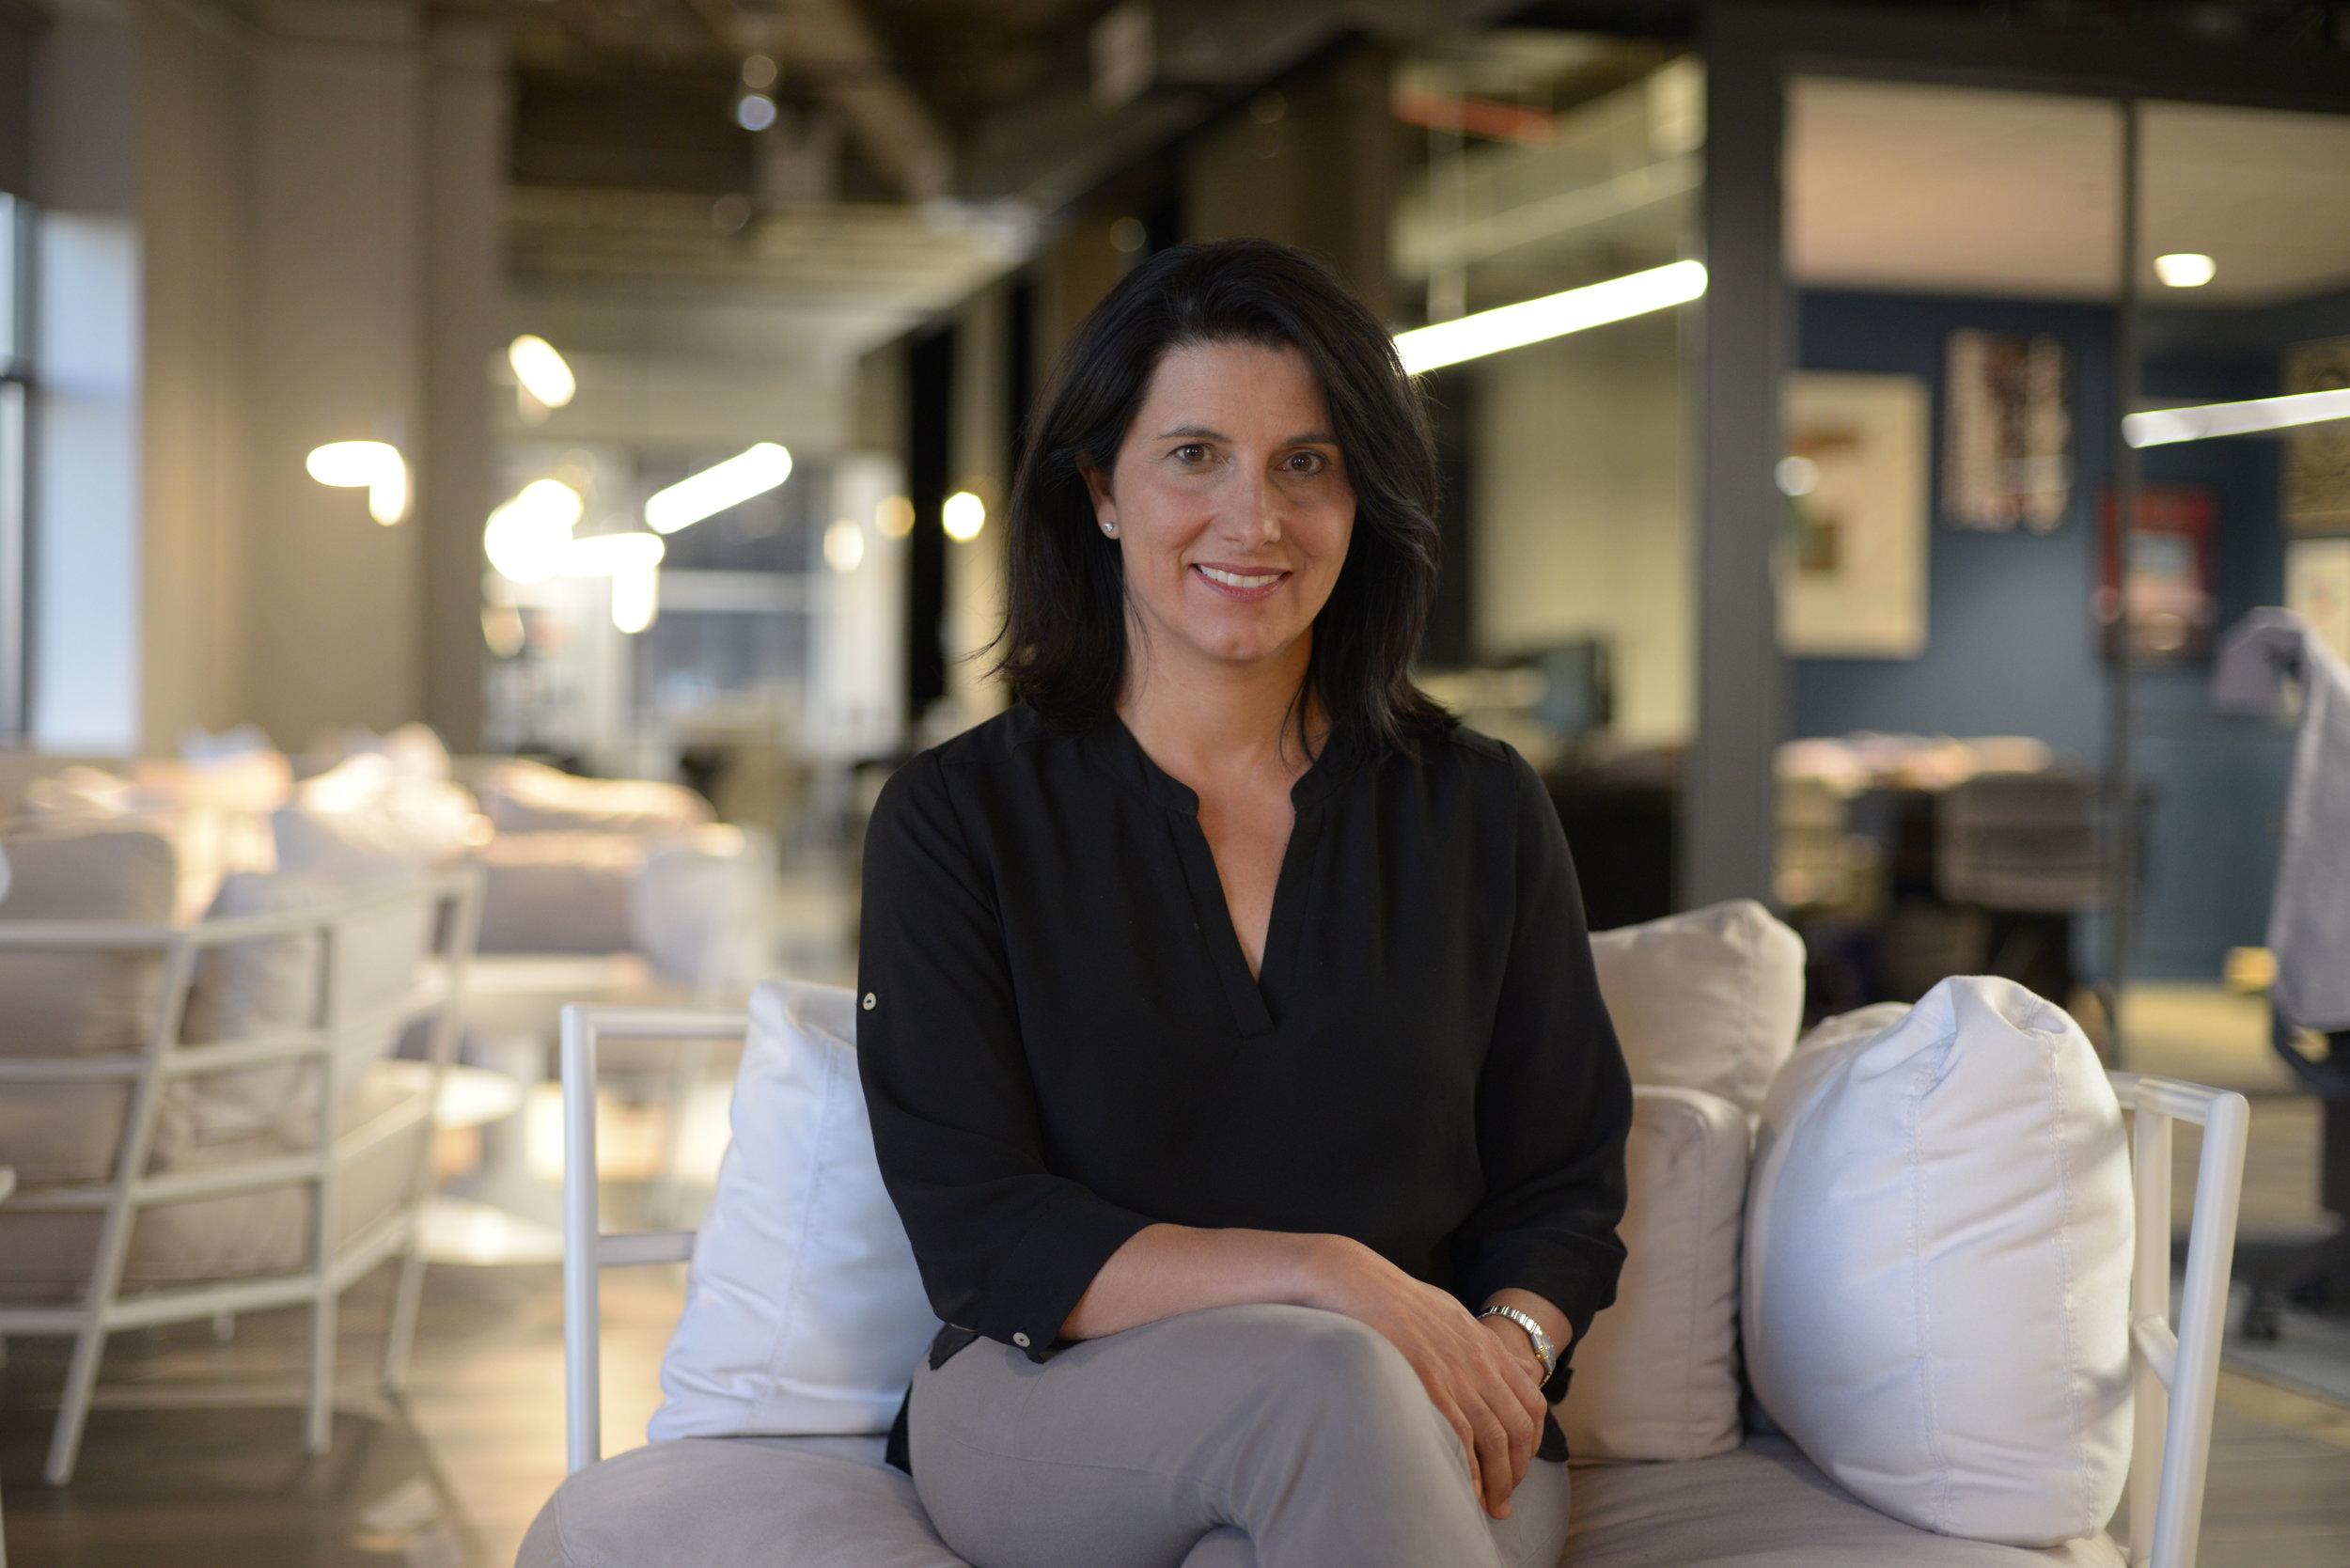 Beth Ferreira, FirstMark Capital